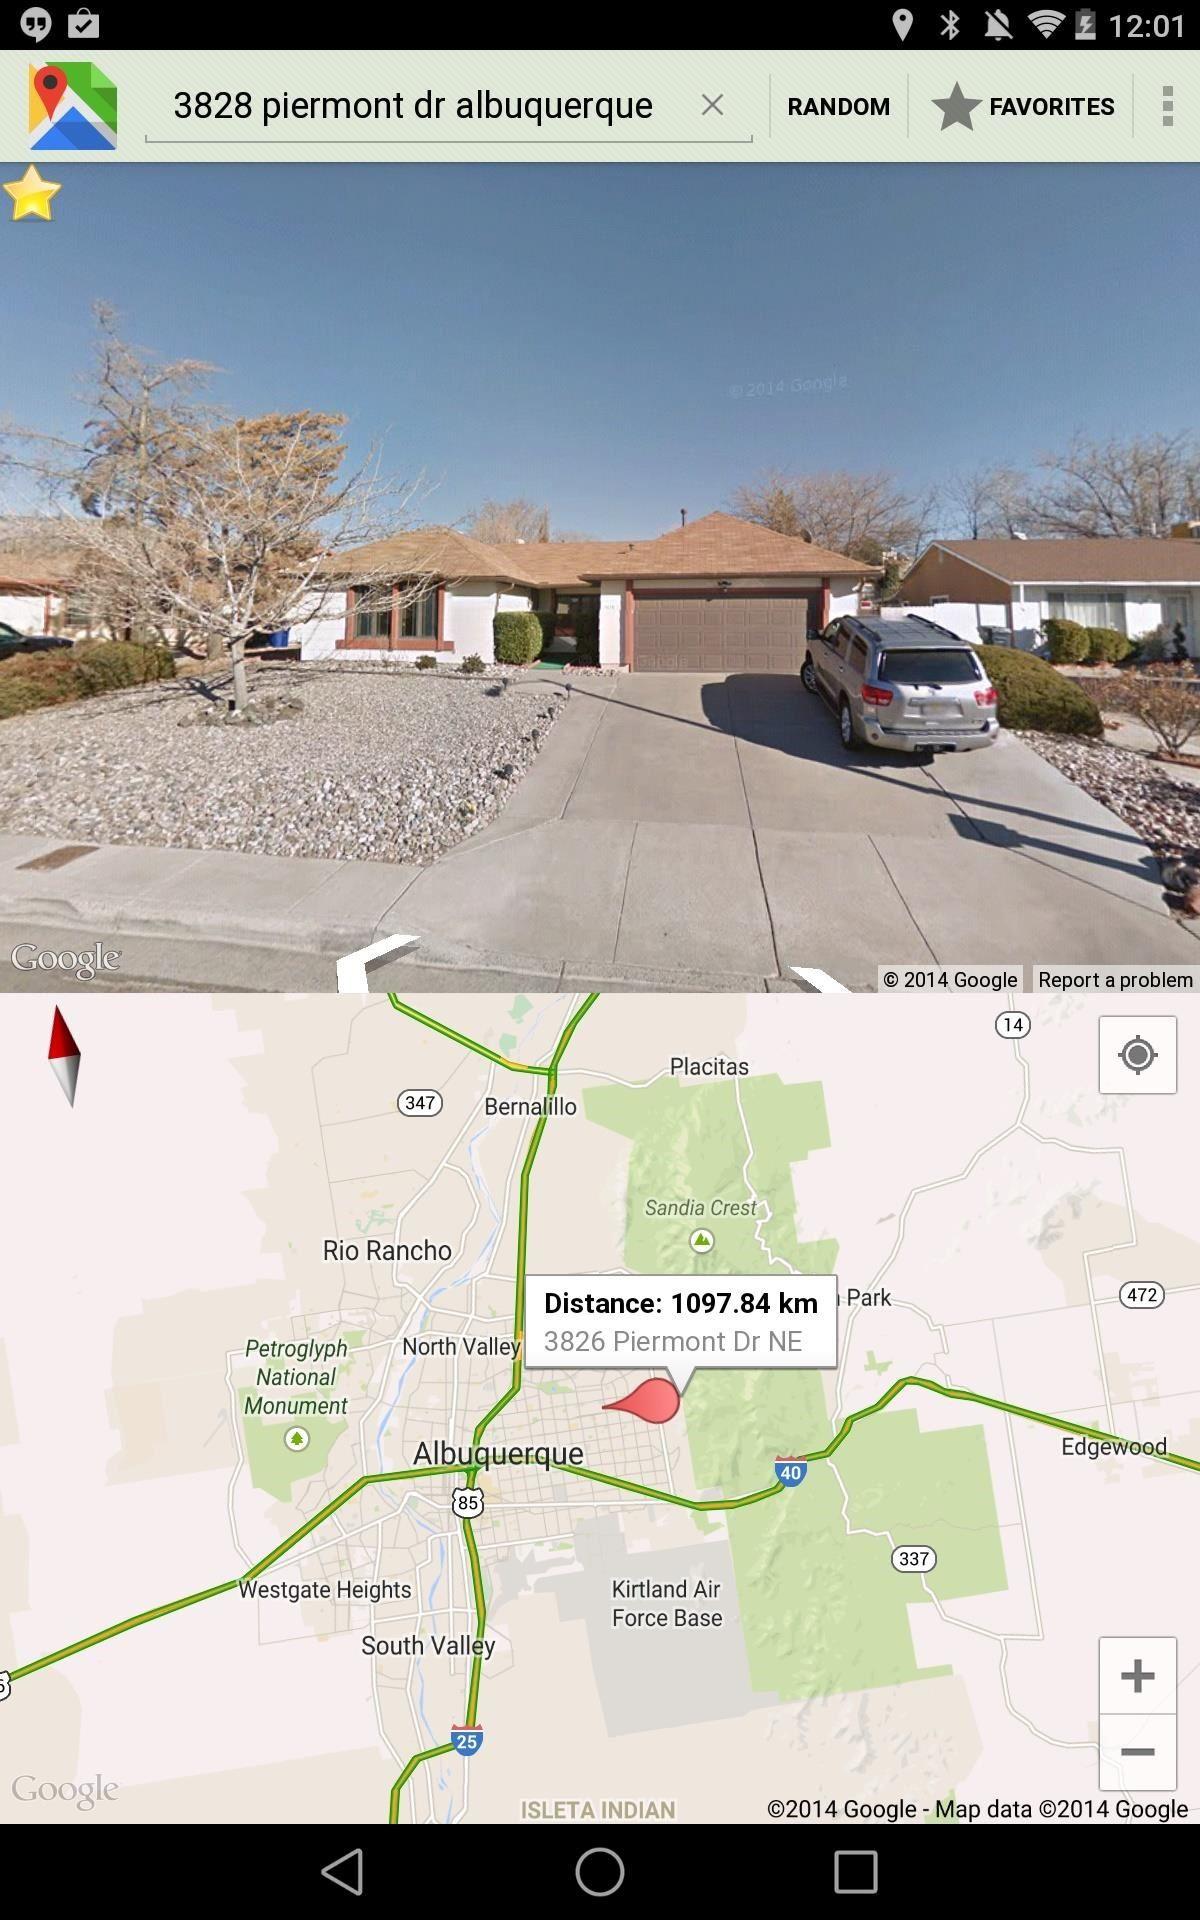 How to View Google Maps & Street View in Split-Screen Mode on ... Google Maps Albuquerque on microsoft albuquerque, zillow albuquerque, photography albuquerque, mapquest albuquerque, area code map albuquerque, paradise hills albuquerque,